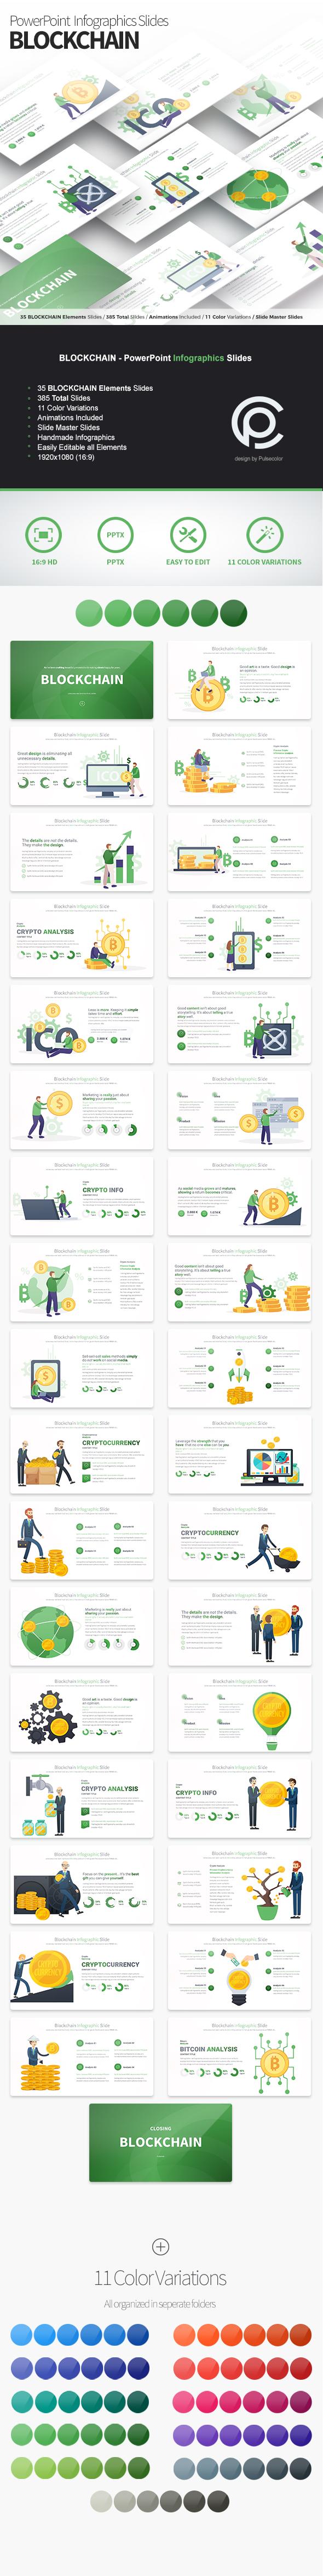 BLOCKCHAIN - PowerPoint Infographics Slides